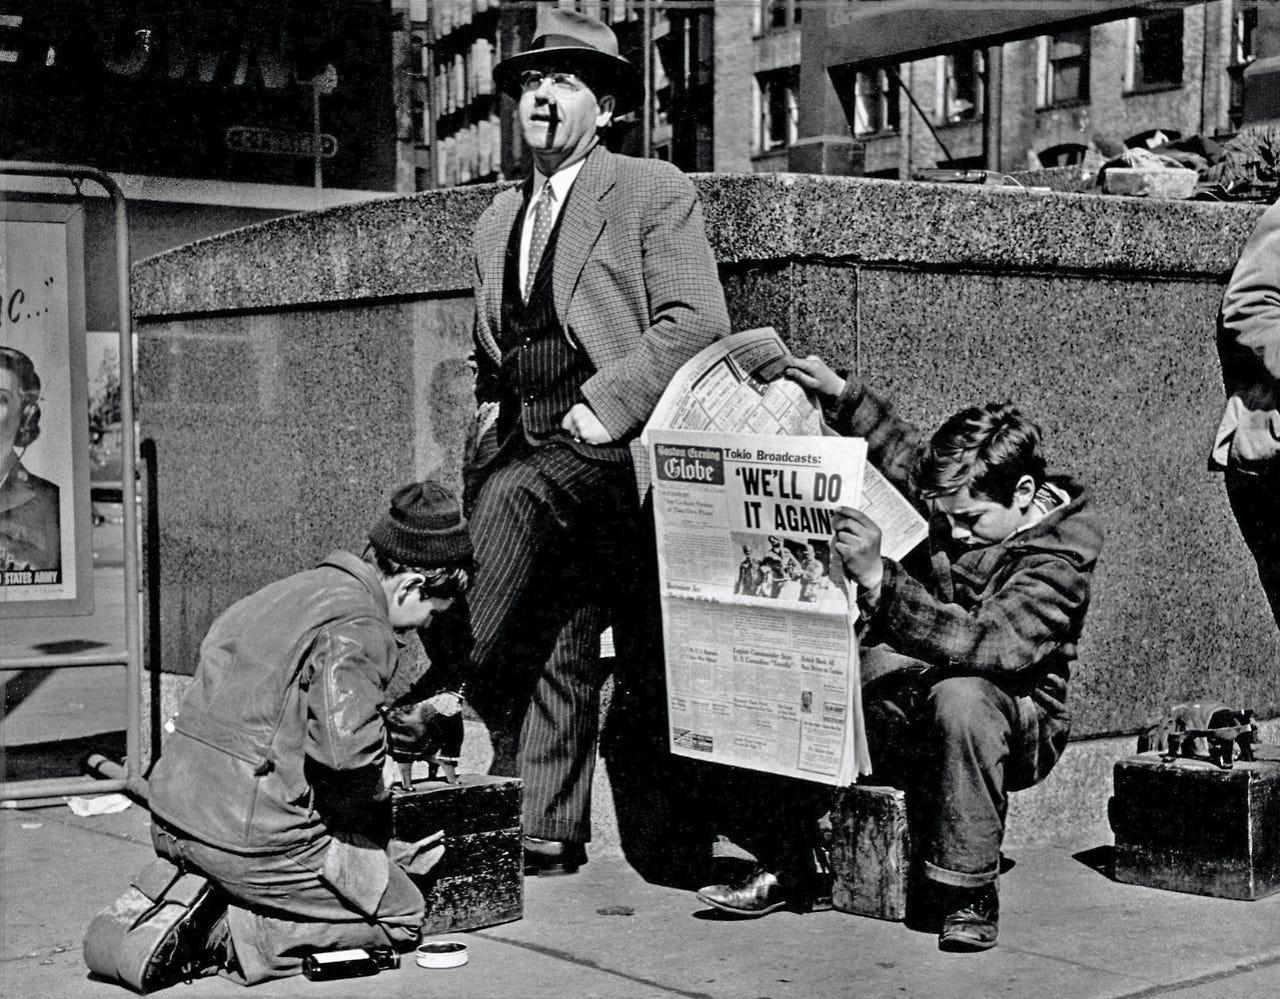 Shoeshine boys in Boston (1943) : TheWayWeWere